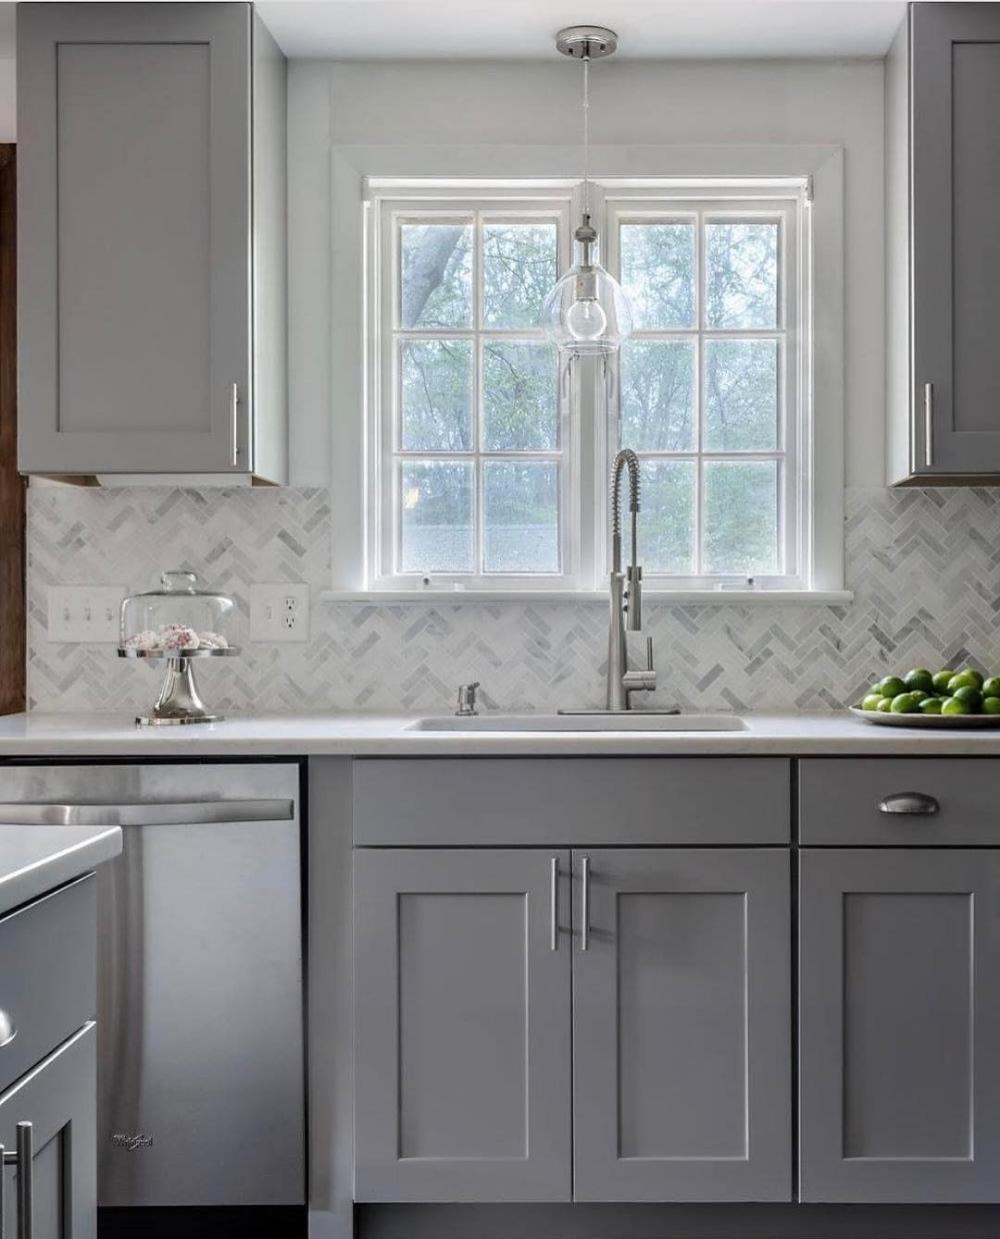 White Walls Gray Cabinets Gray And White Backsplash 3 Grey